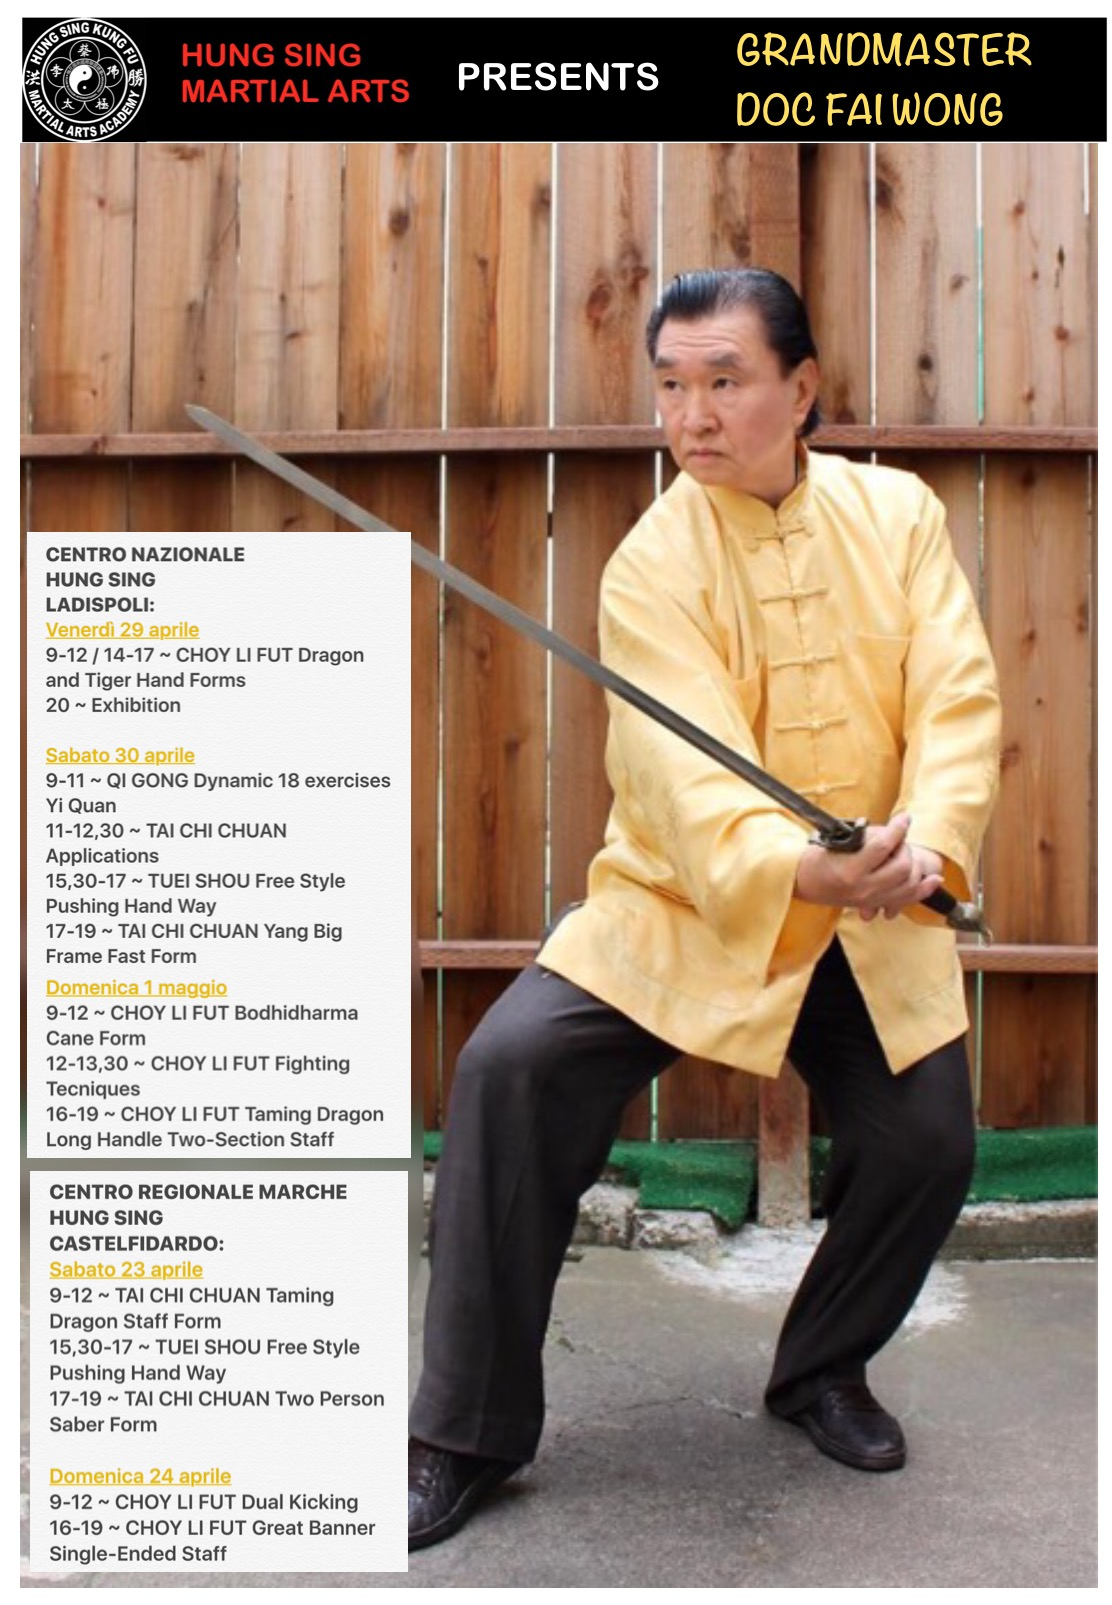 docfaiwong2016